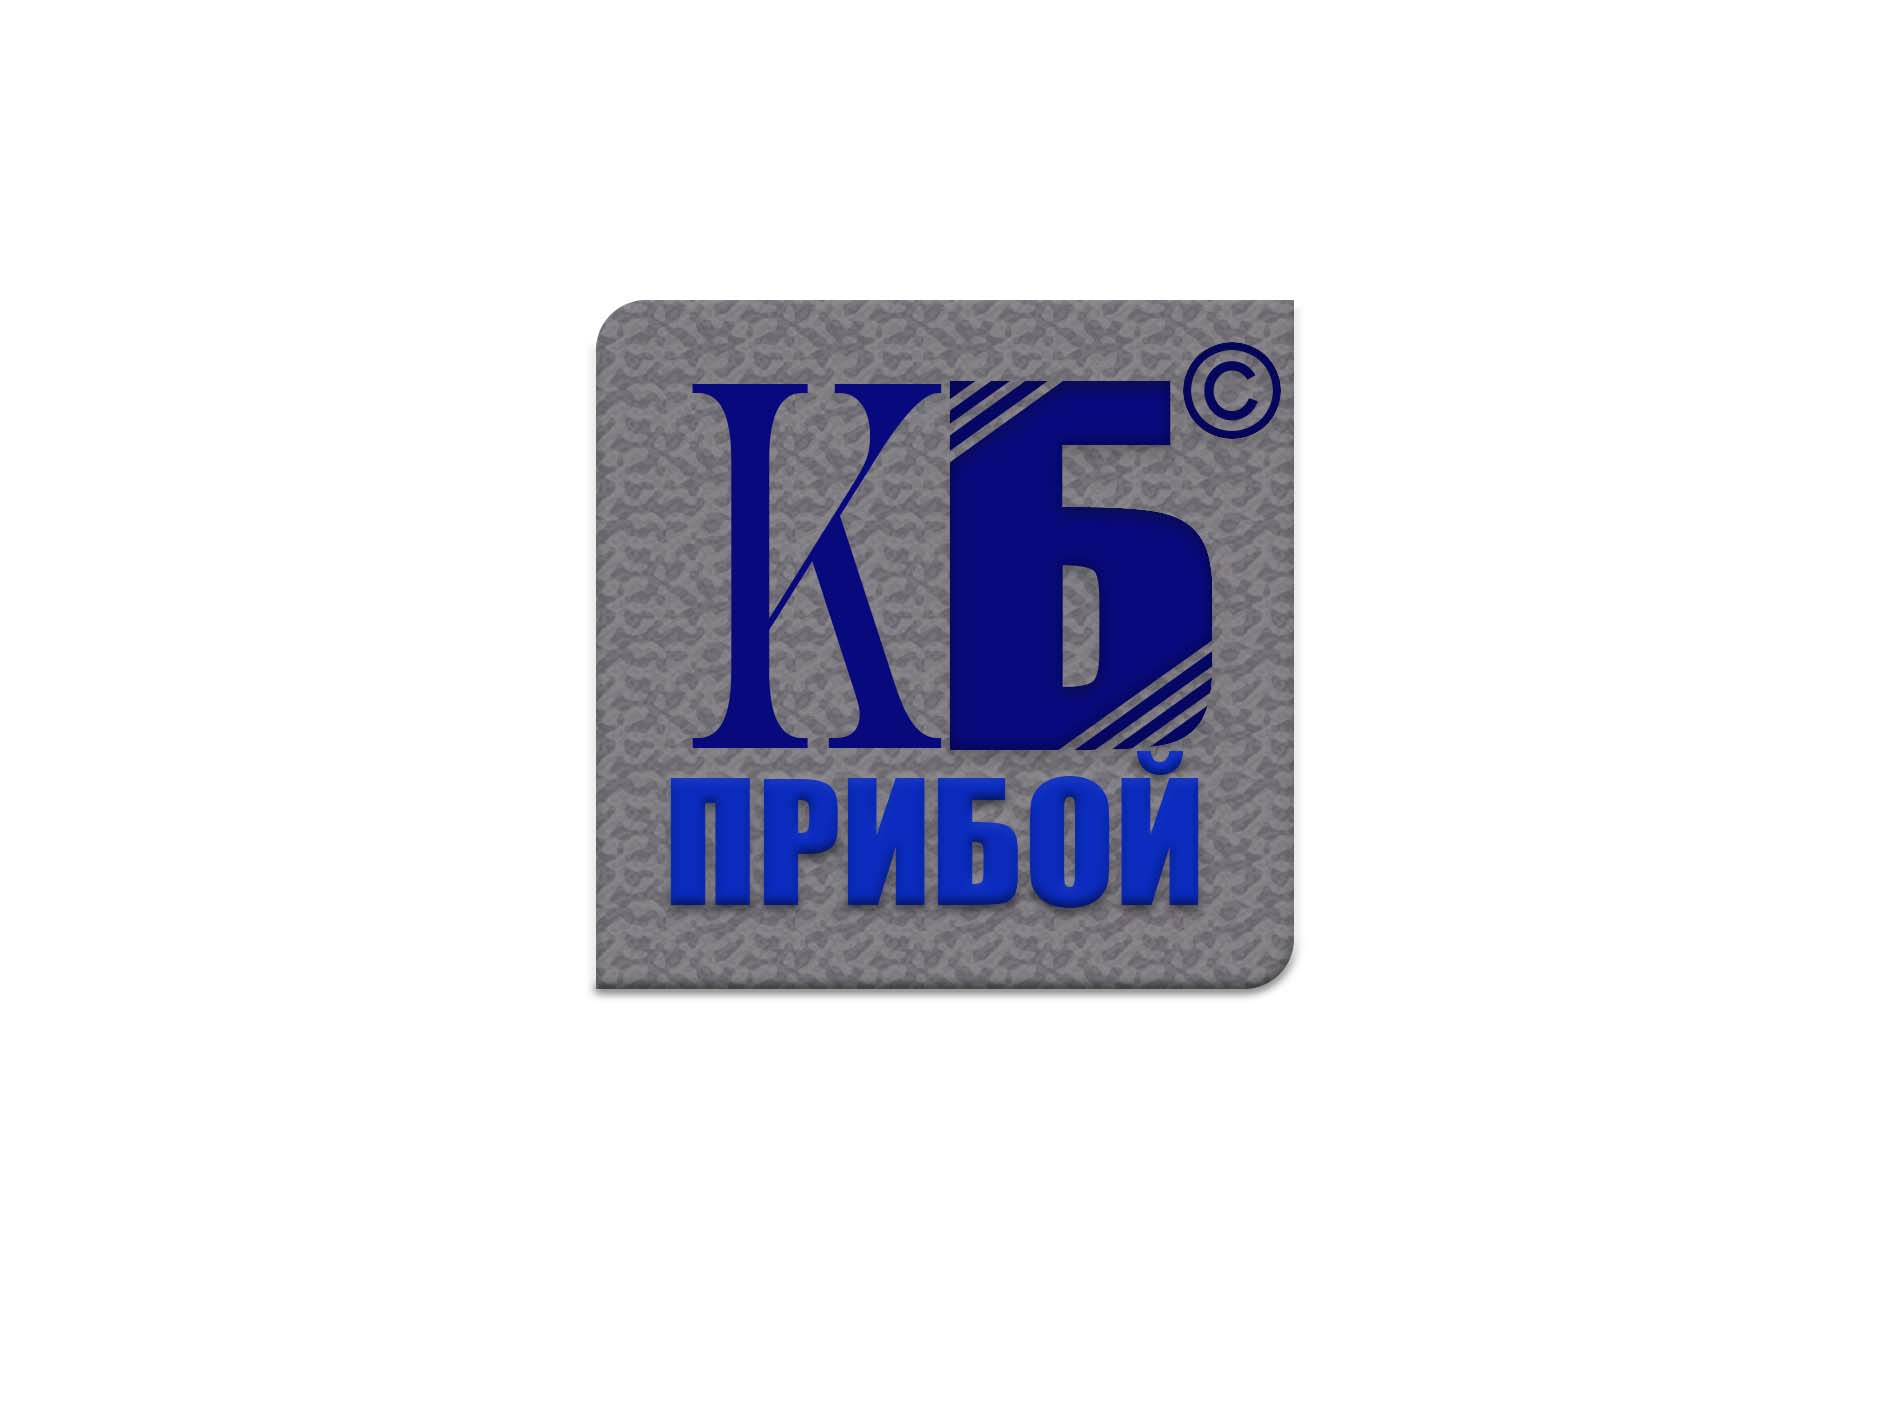 Разработка логотипа и фирменного стиля для КБ Прибой фото f_7315b27452c28b18.jpg